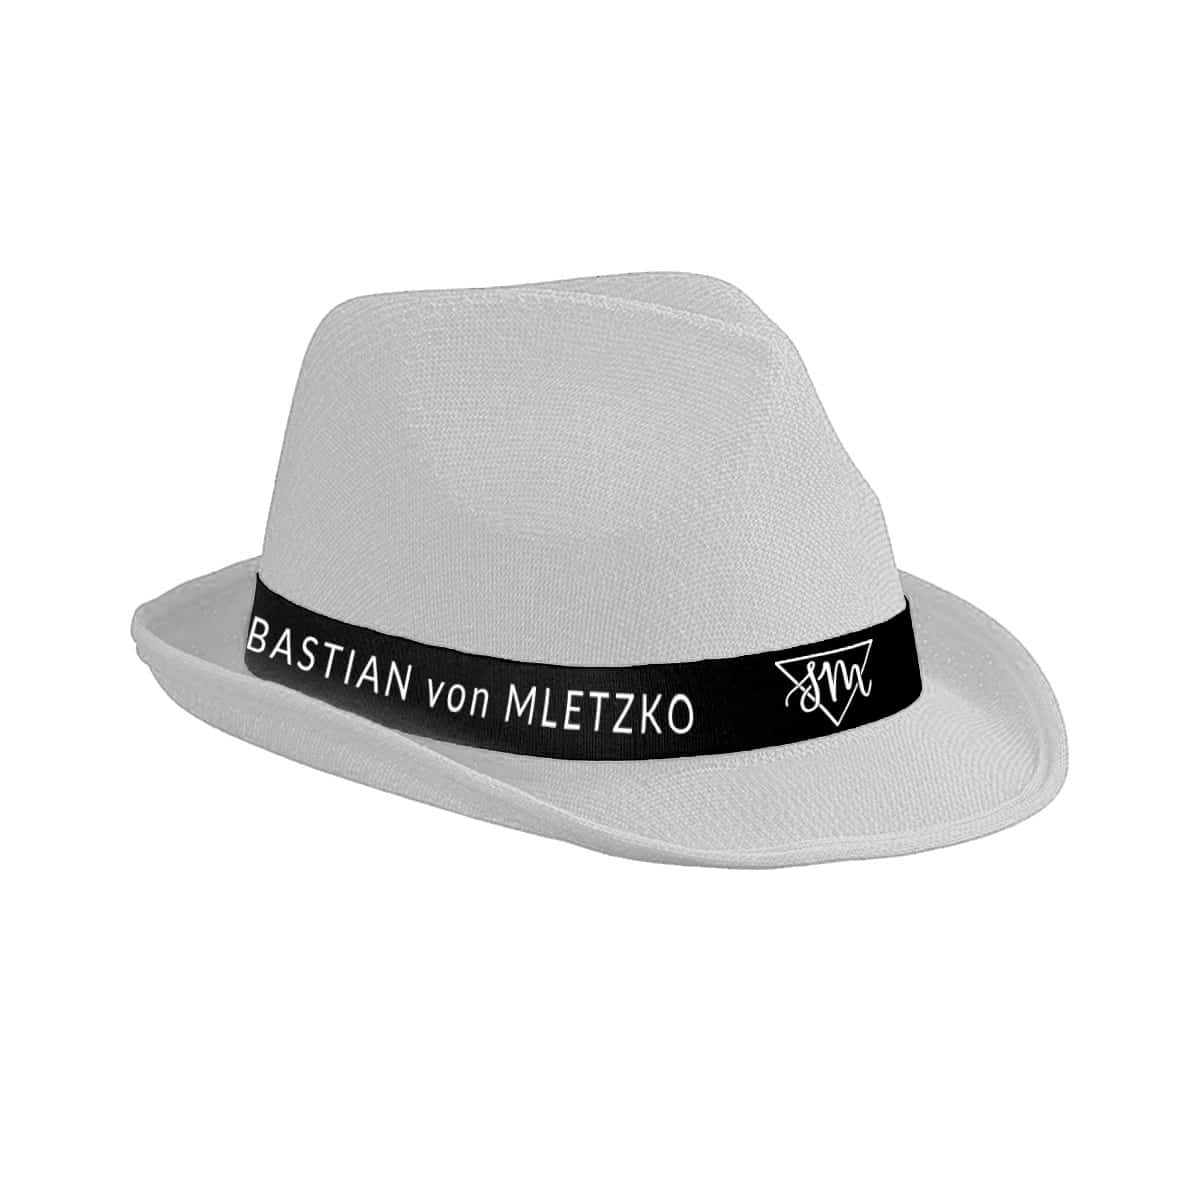 Sebastian von Mletzko Hut weiss